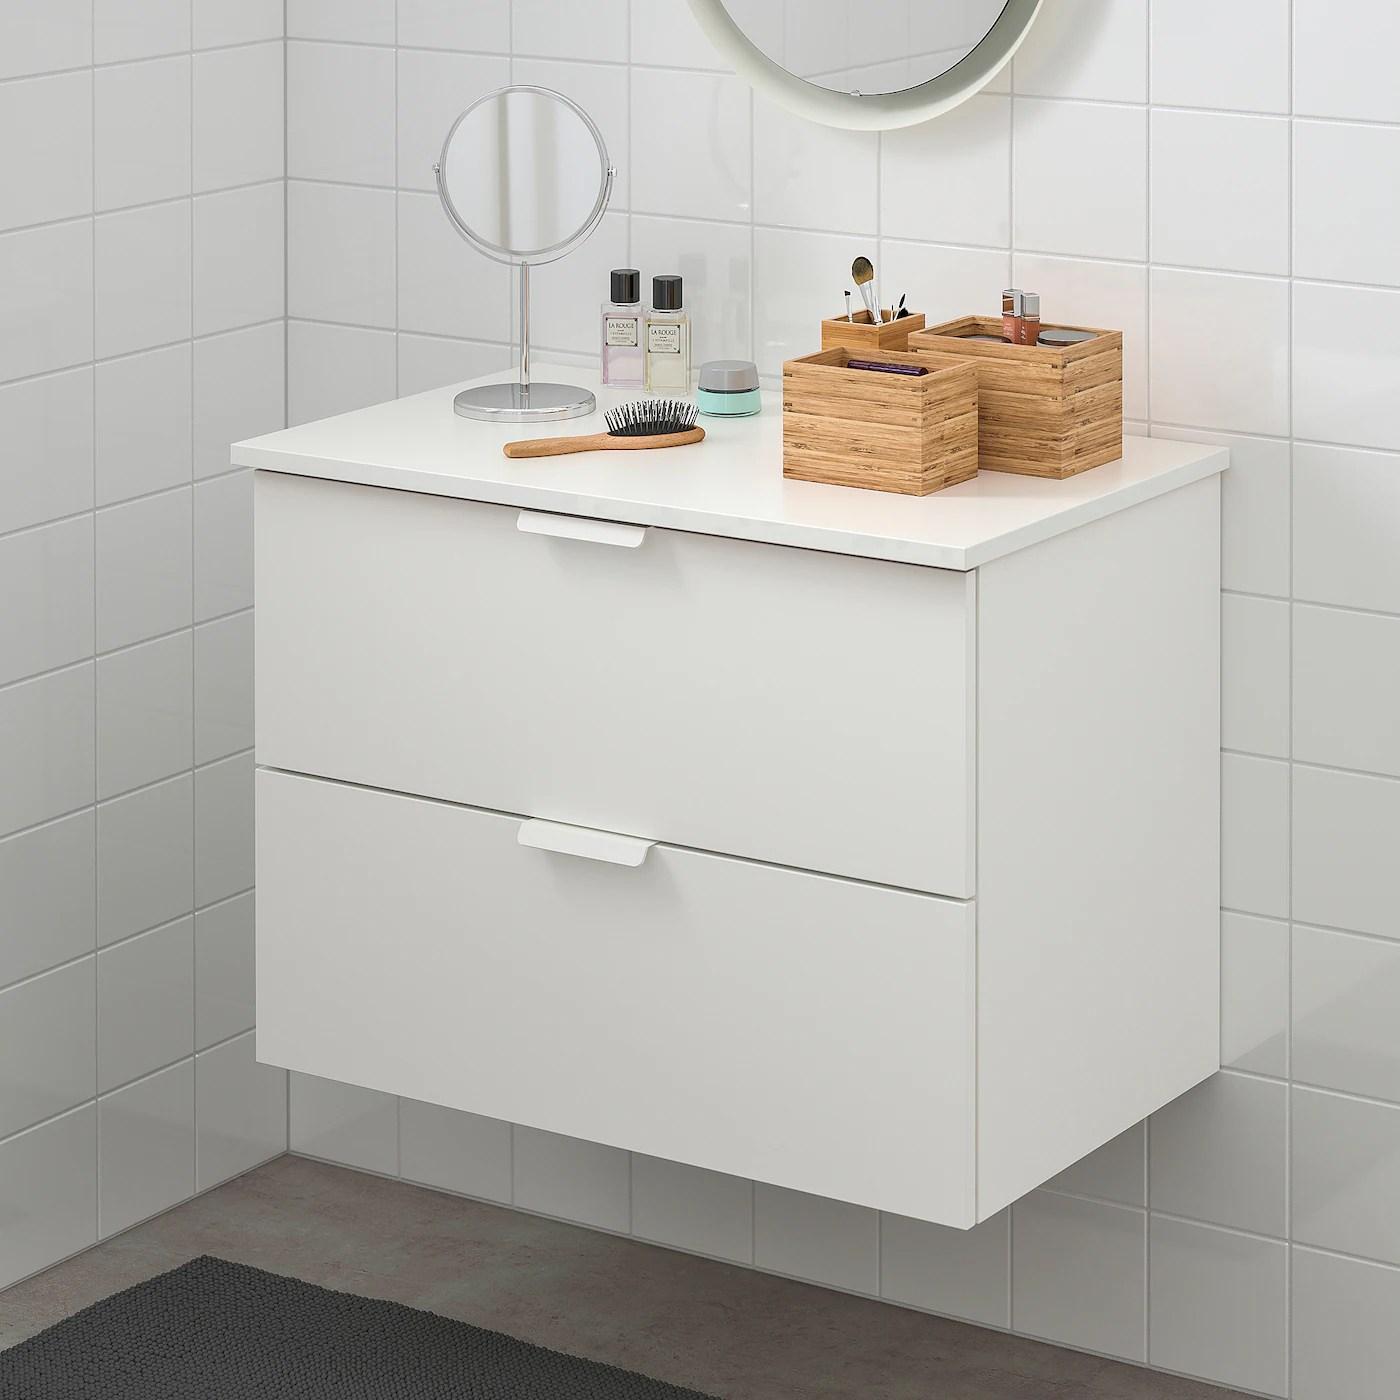 Godmorgon Tolken Meuble Lavabo 2tir Blanc Blanc Ikea Suisse